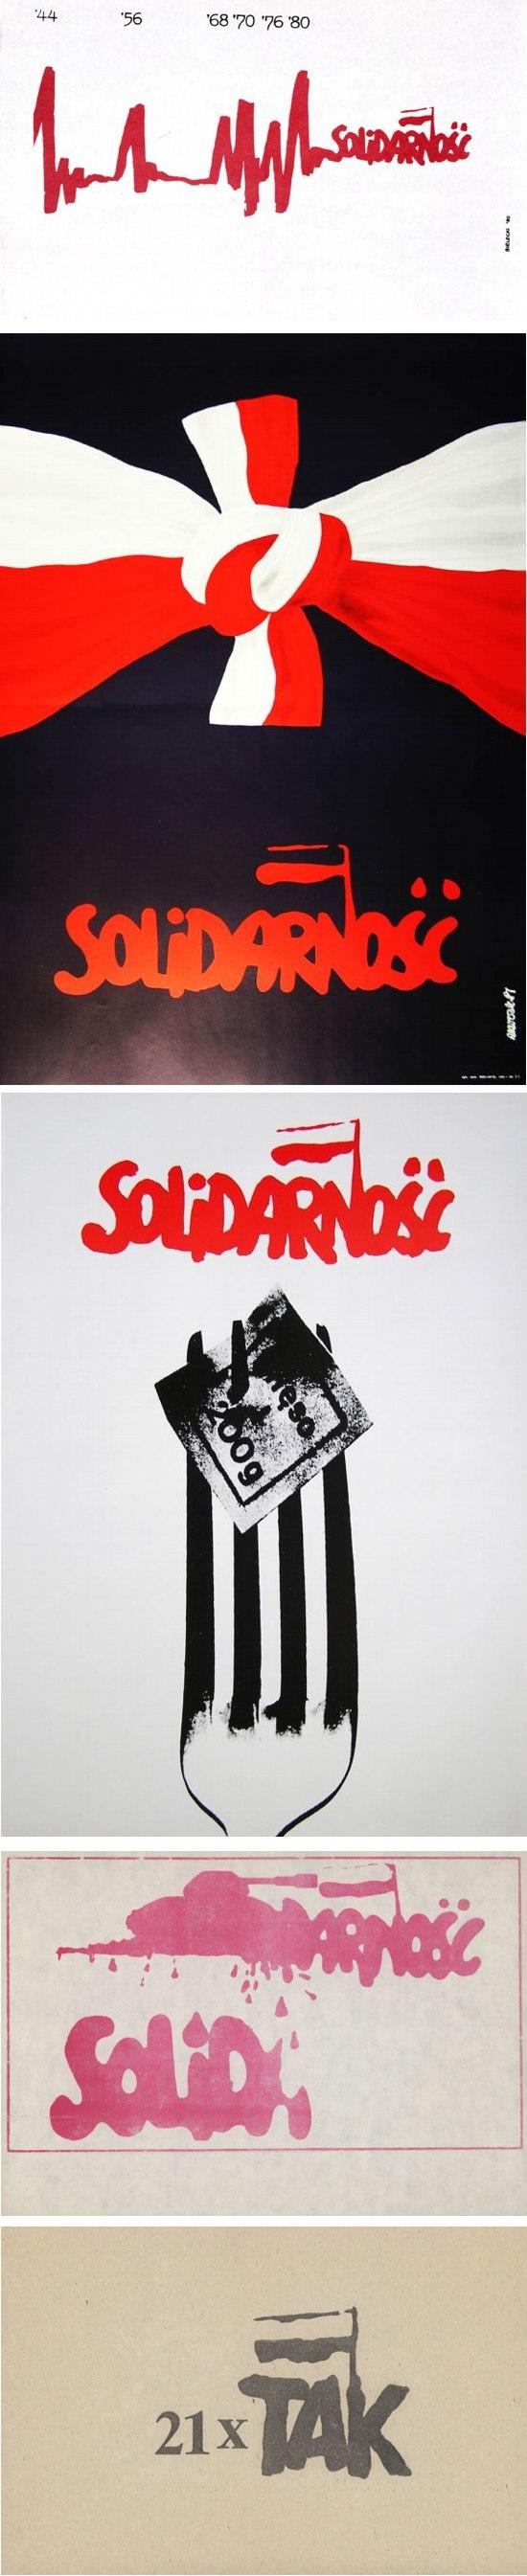 palakty solidarnosc